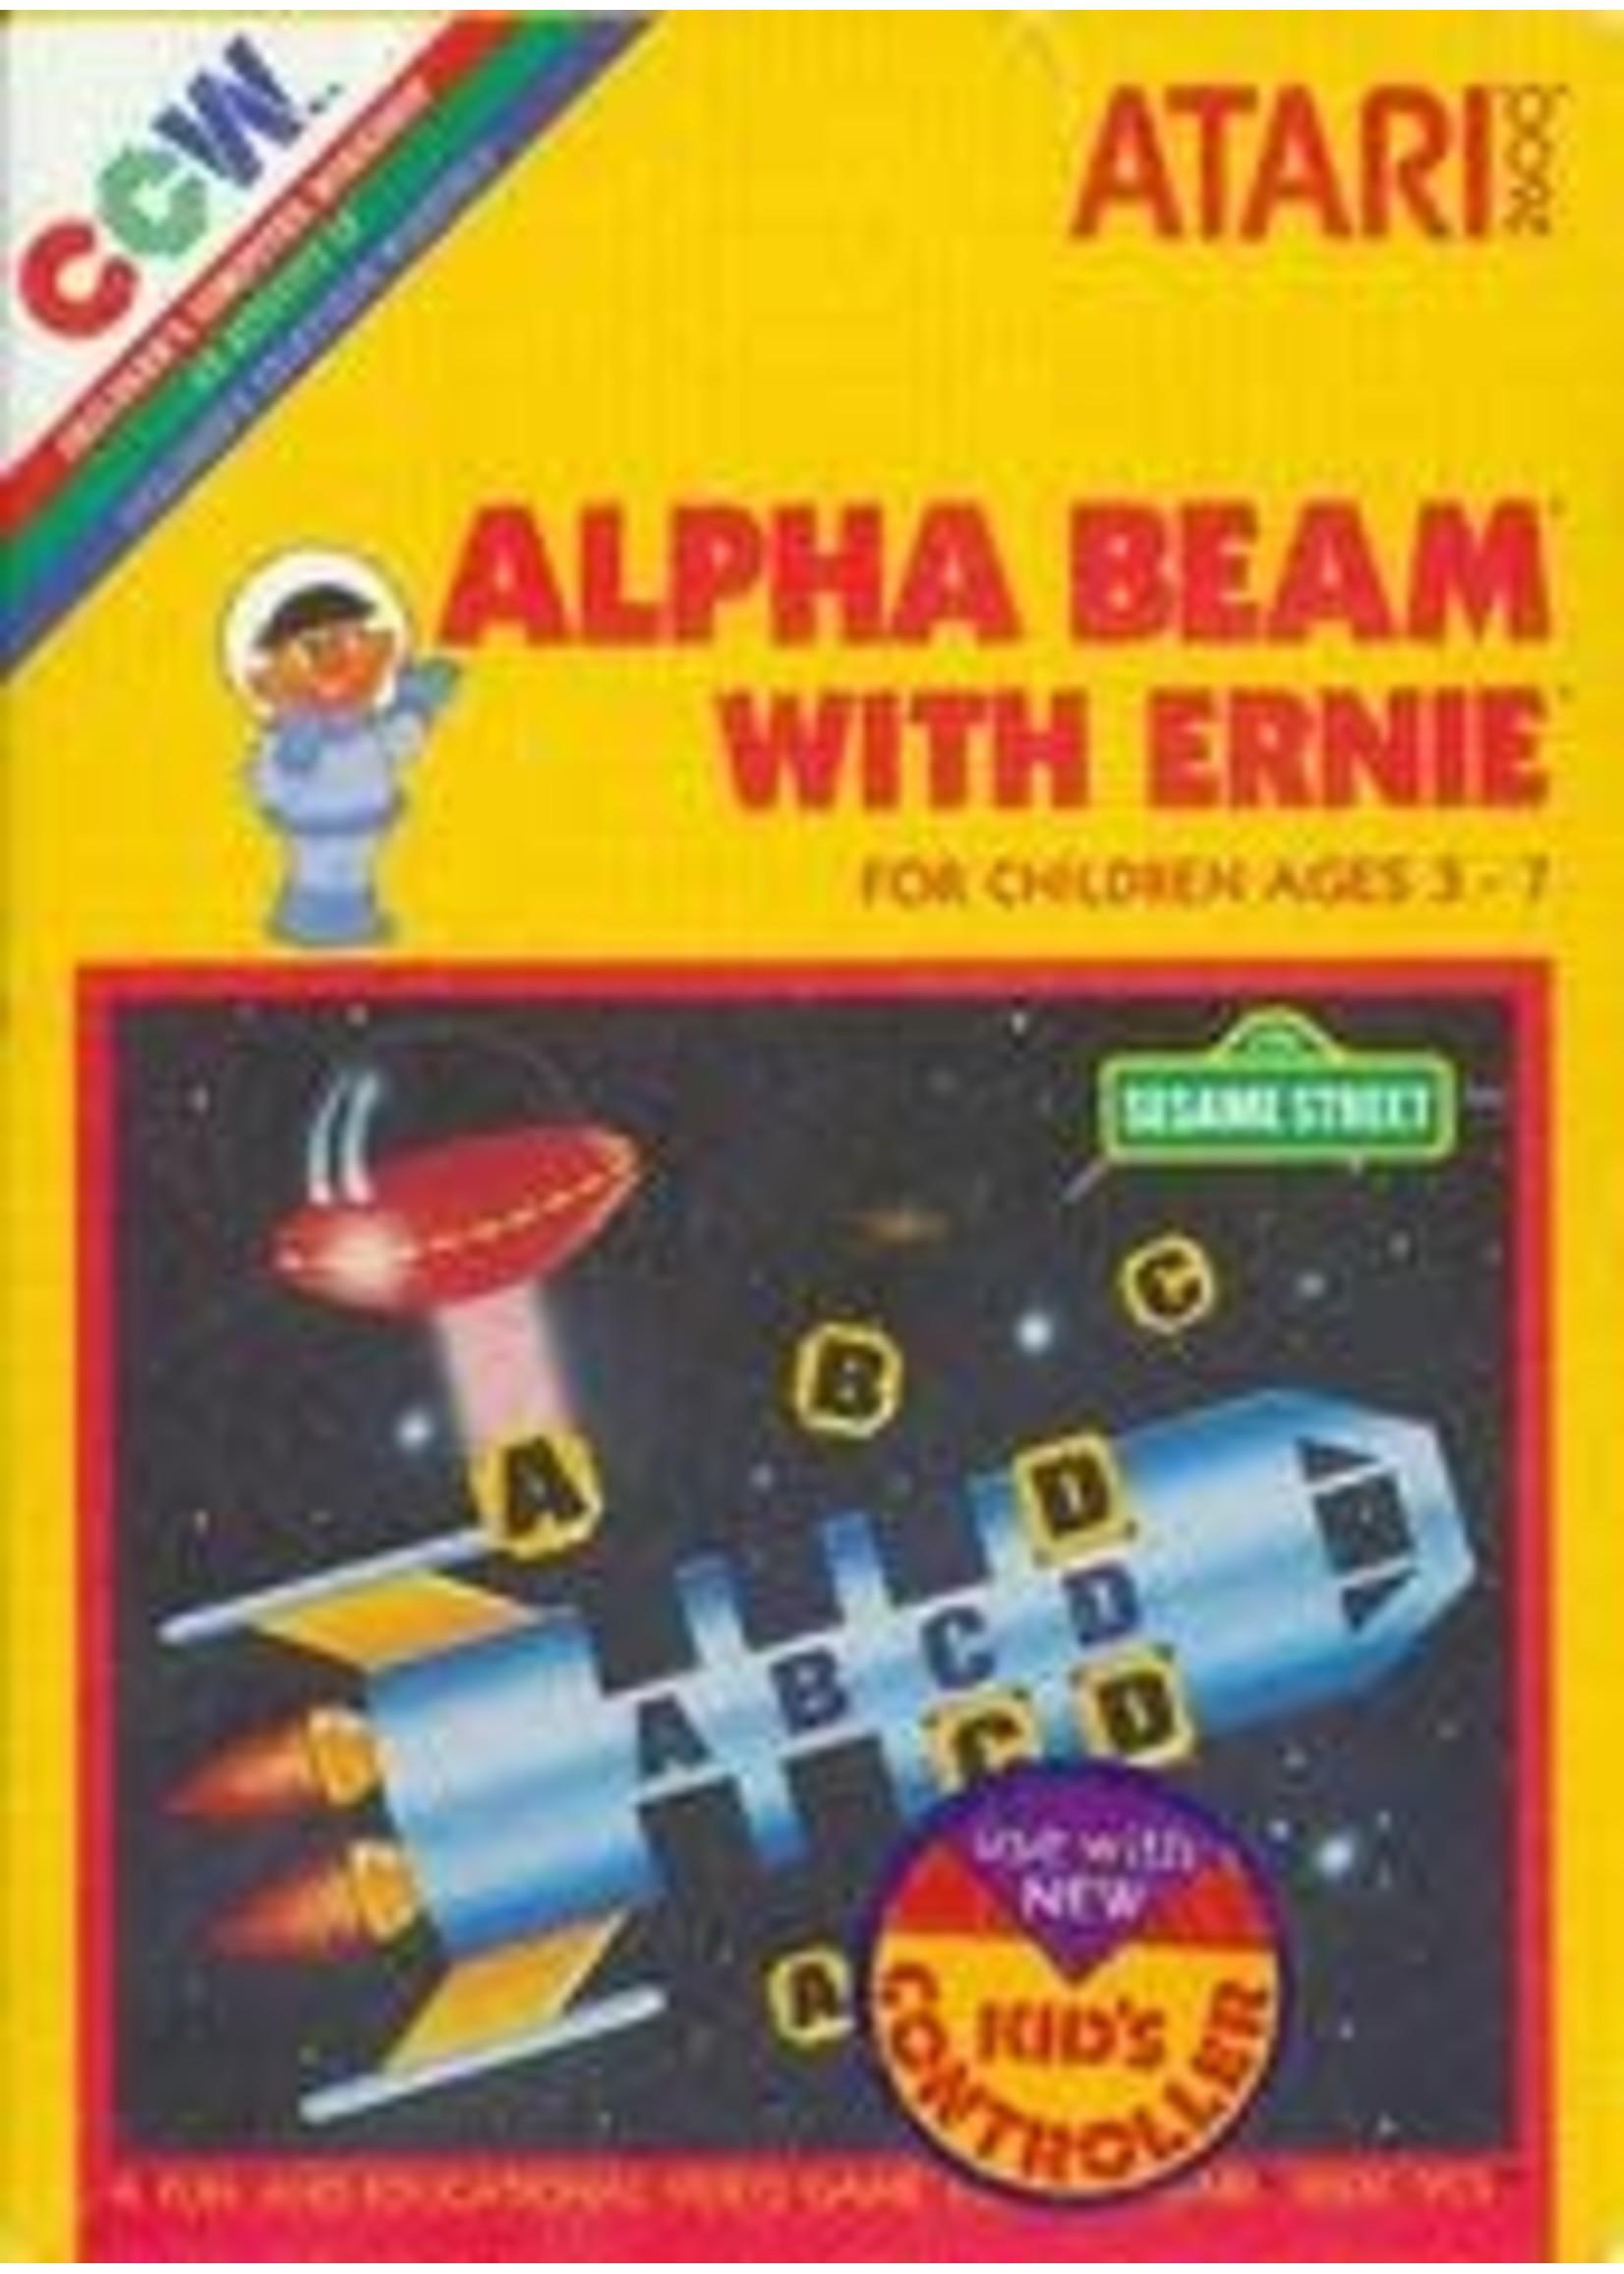 Alpha Beam With Ernie Atari 2600